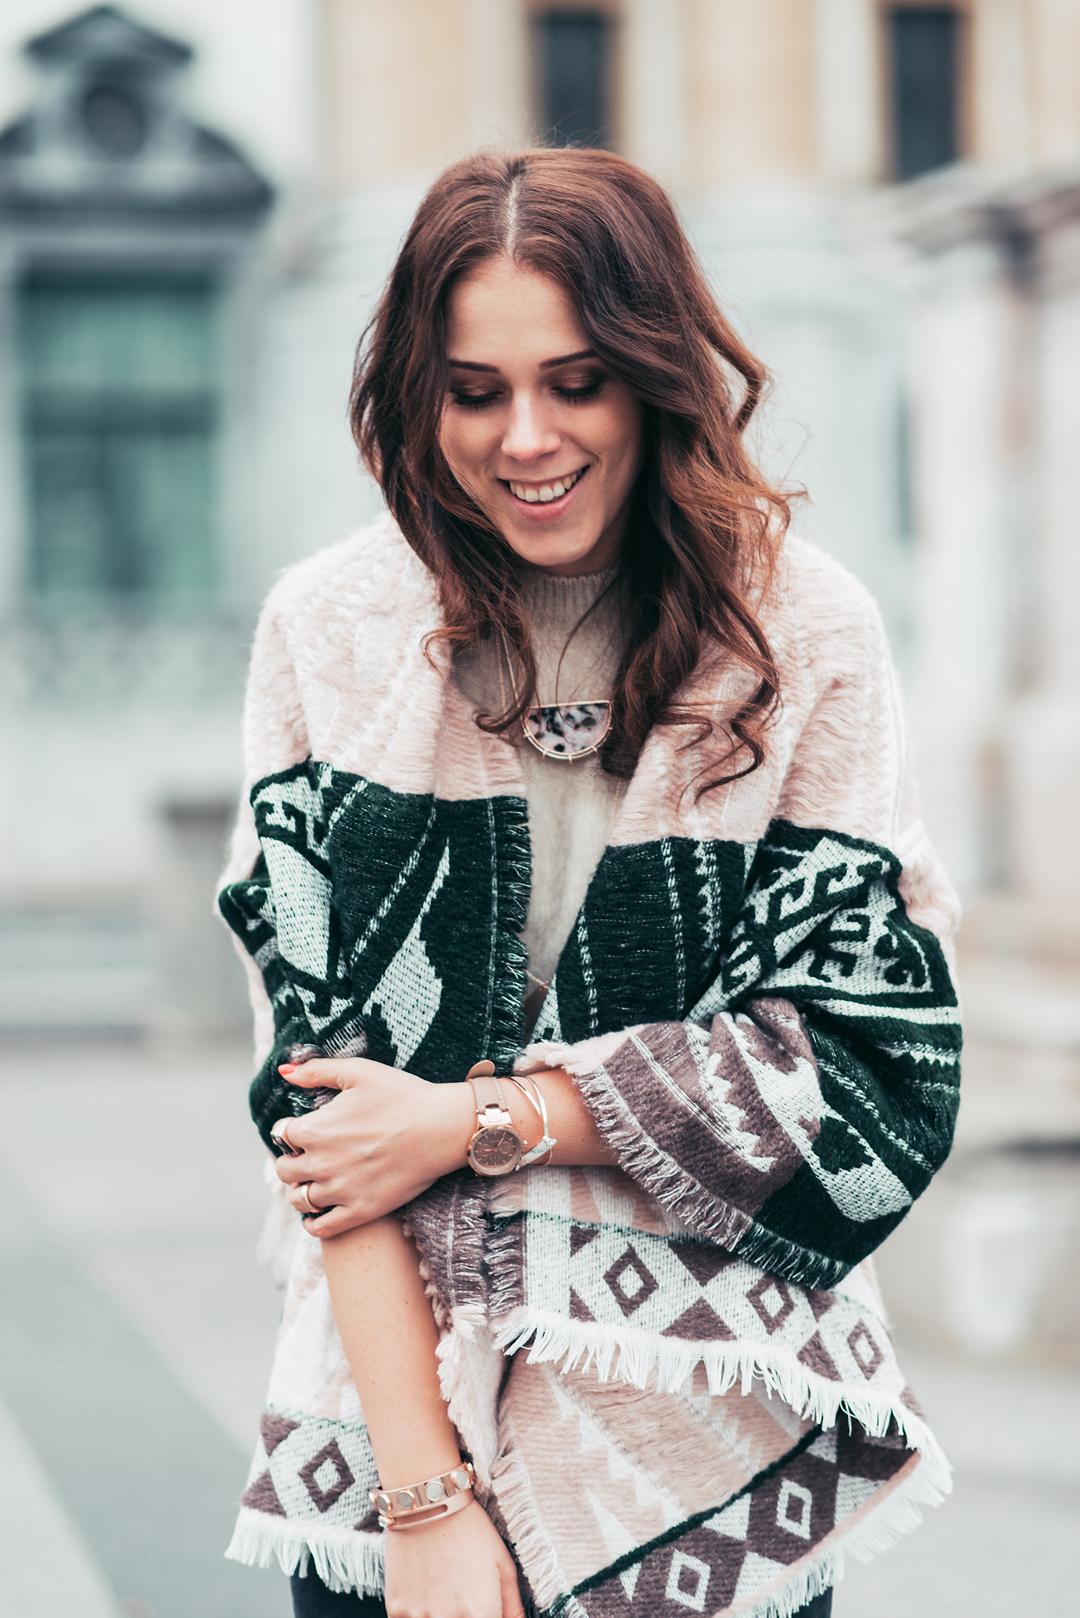 eva-ahacevcic_love-eva_parfois_nakit_modni-dodatki_jewellery_accessories_ootd